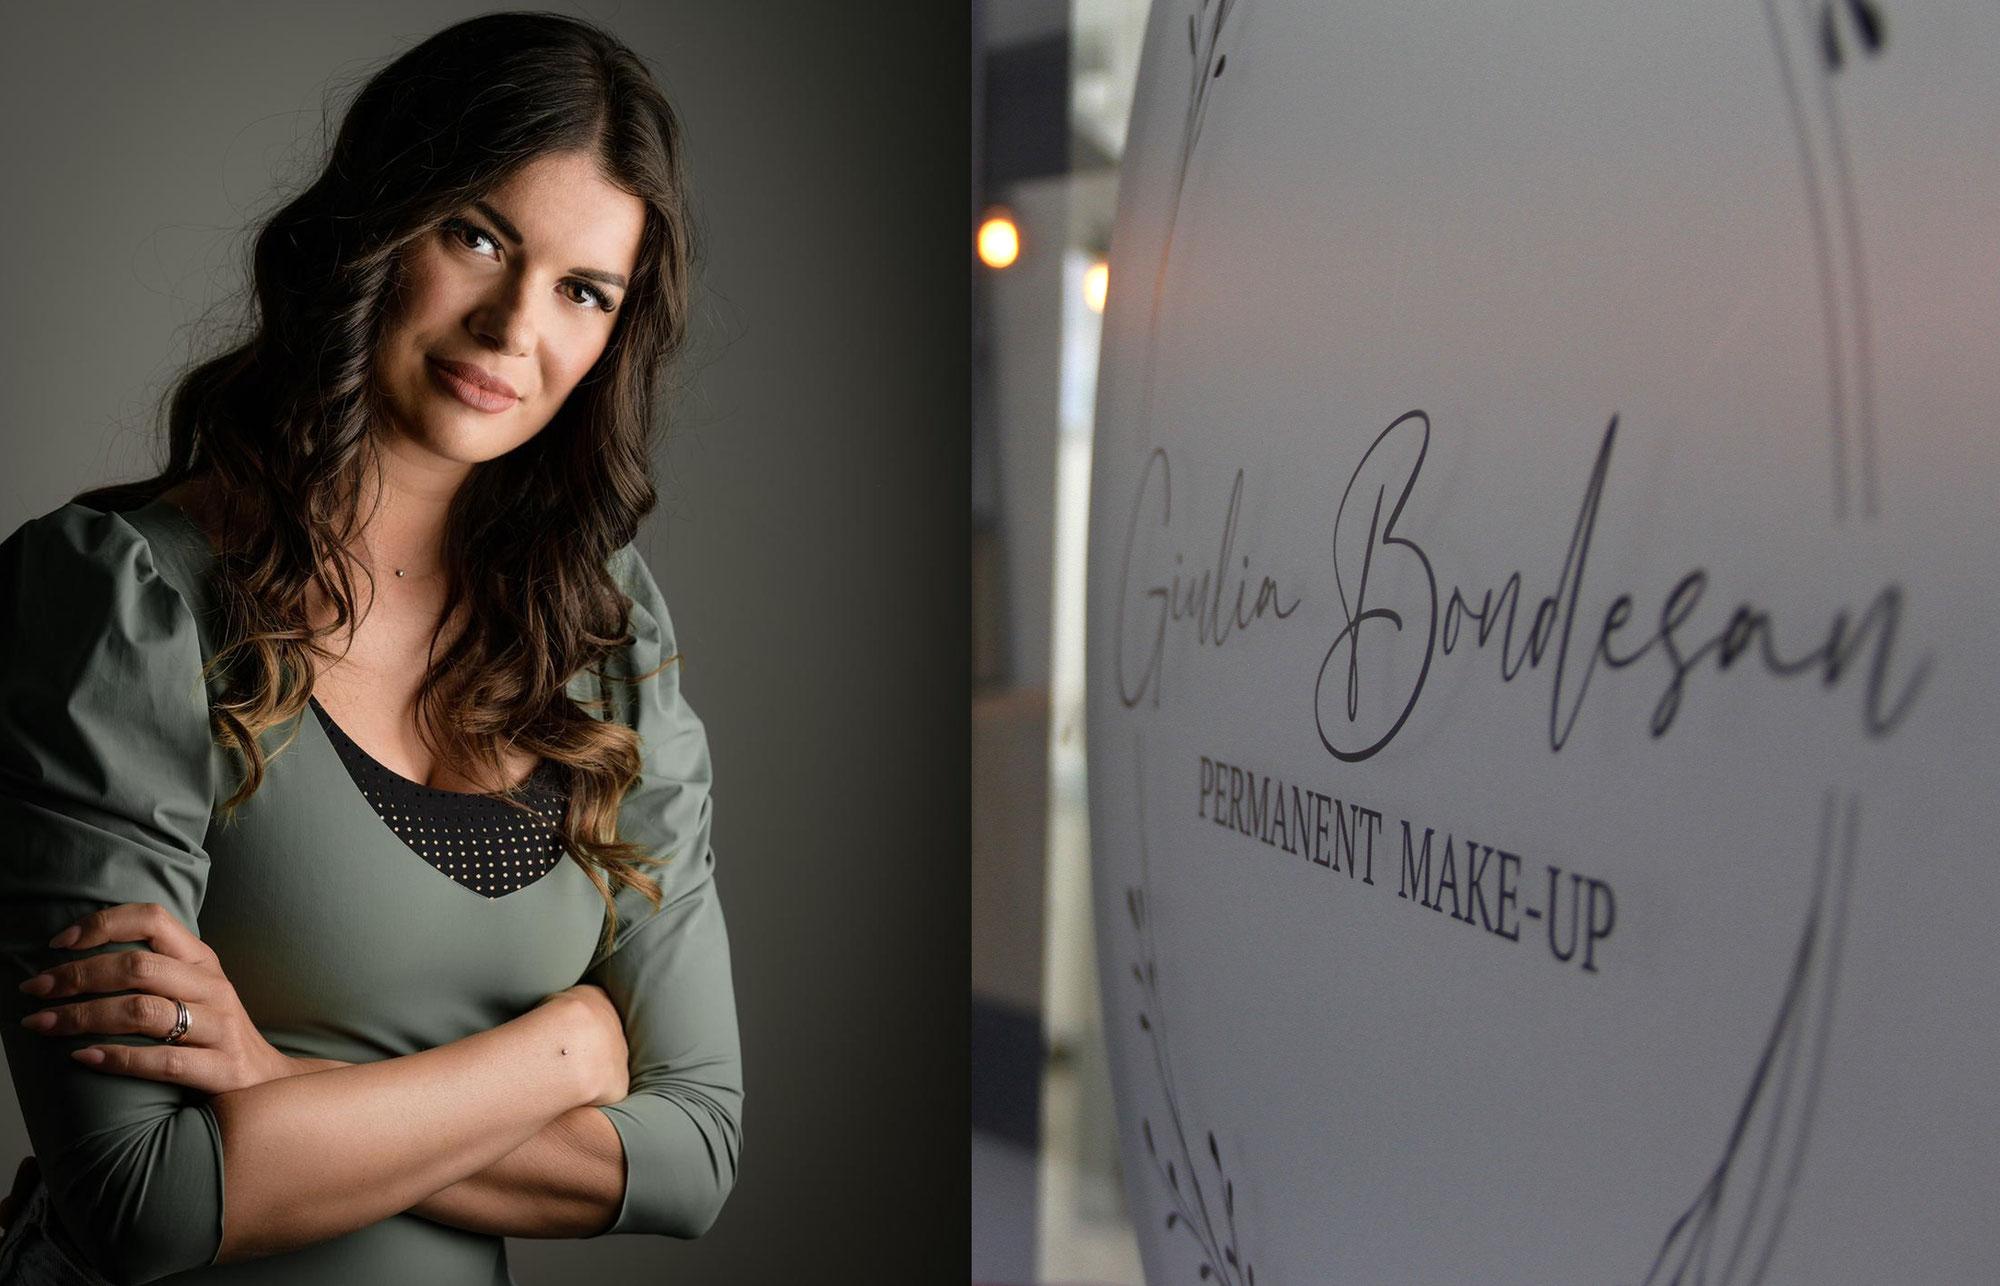 Apre Giulia Bondesan Permanent Make Up